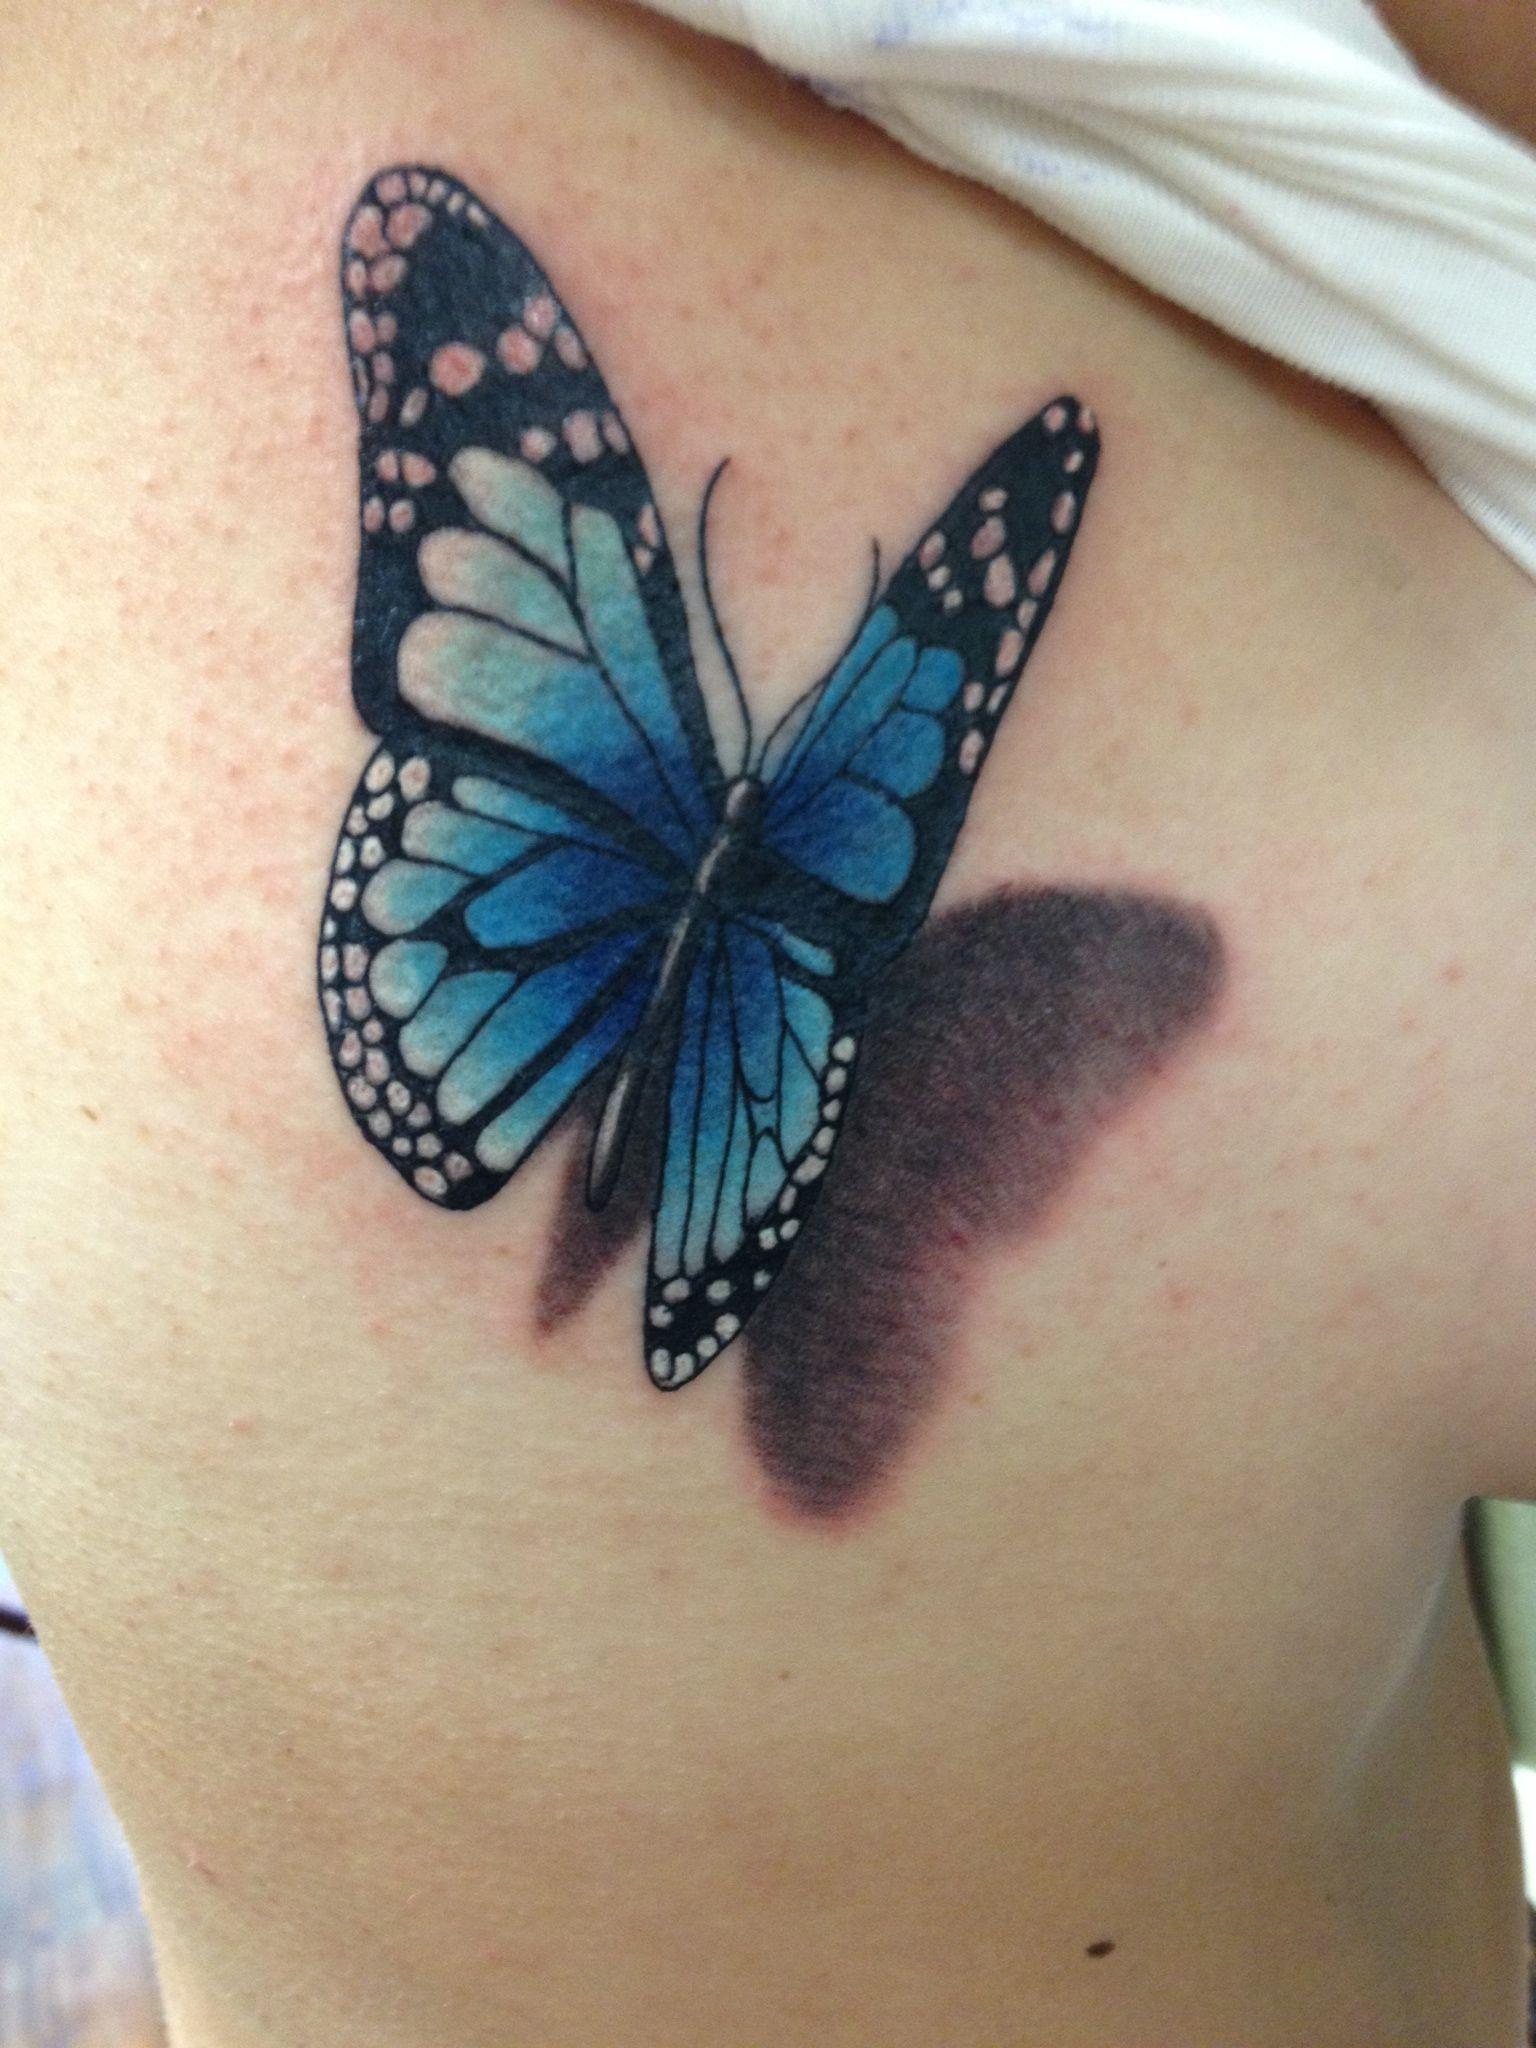 behind ear tattoo Google Search 3d butterfly tattoo